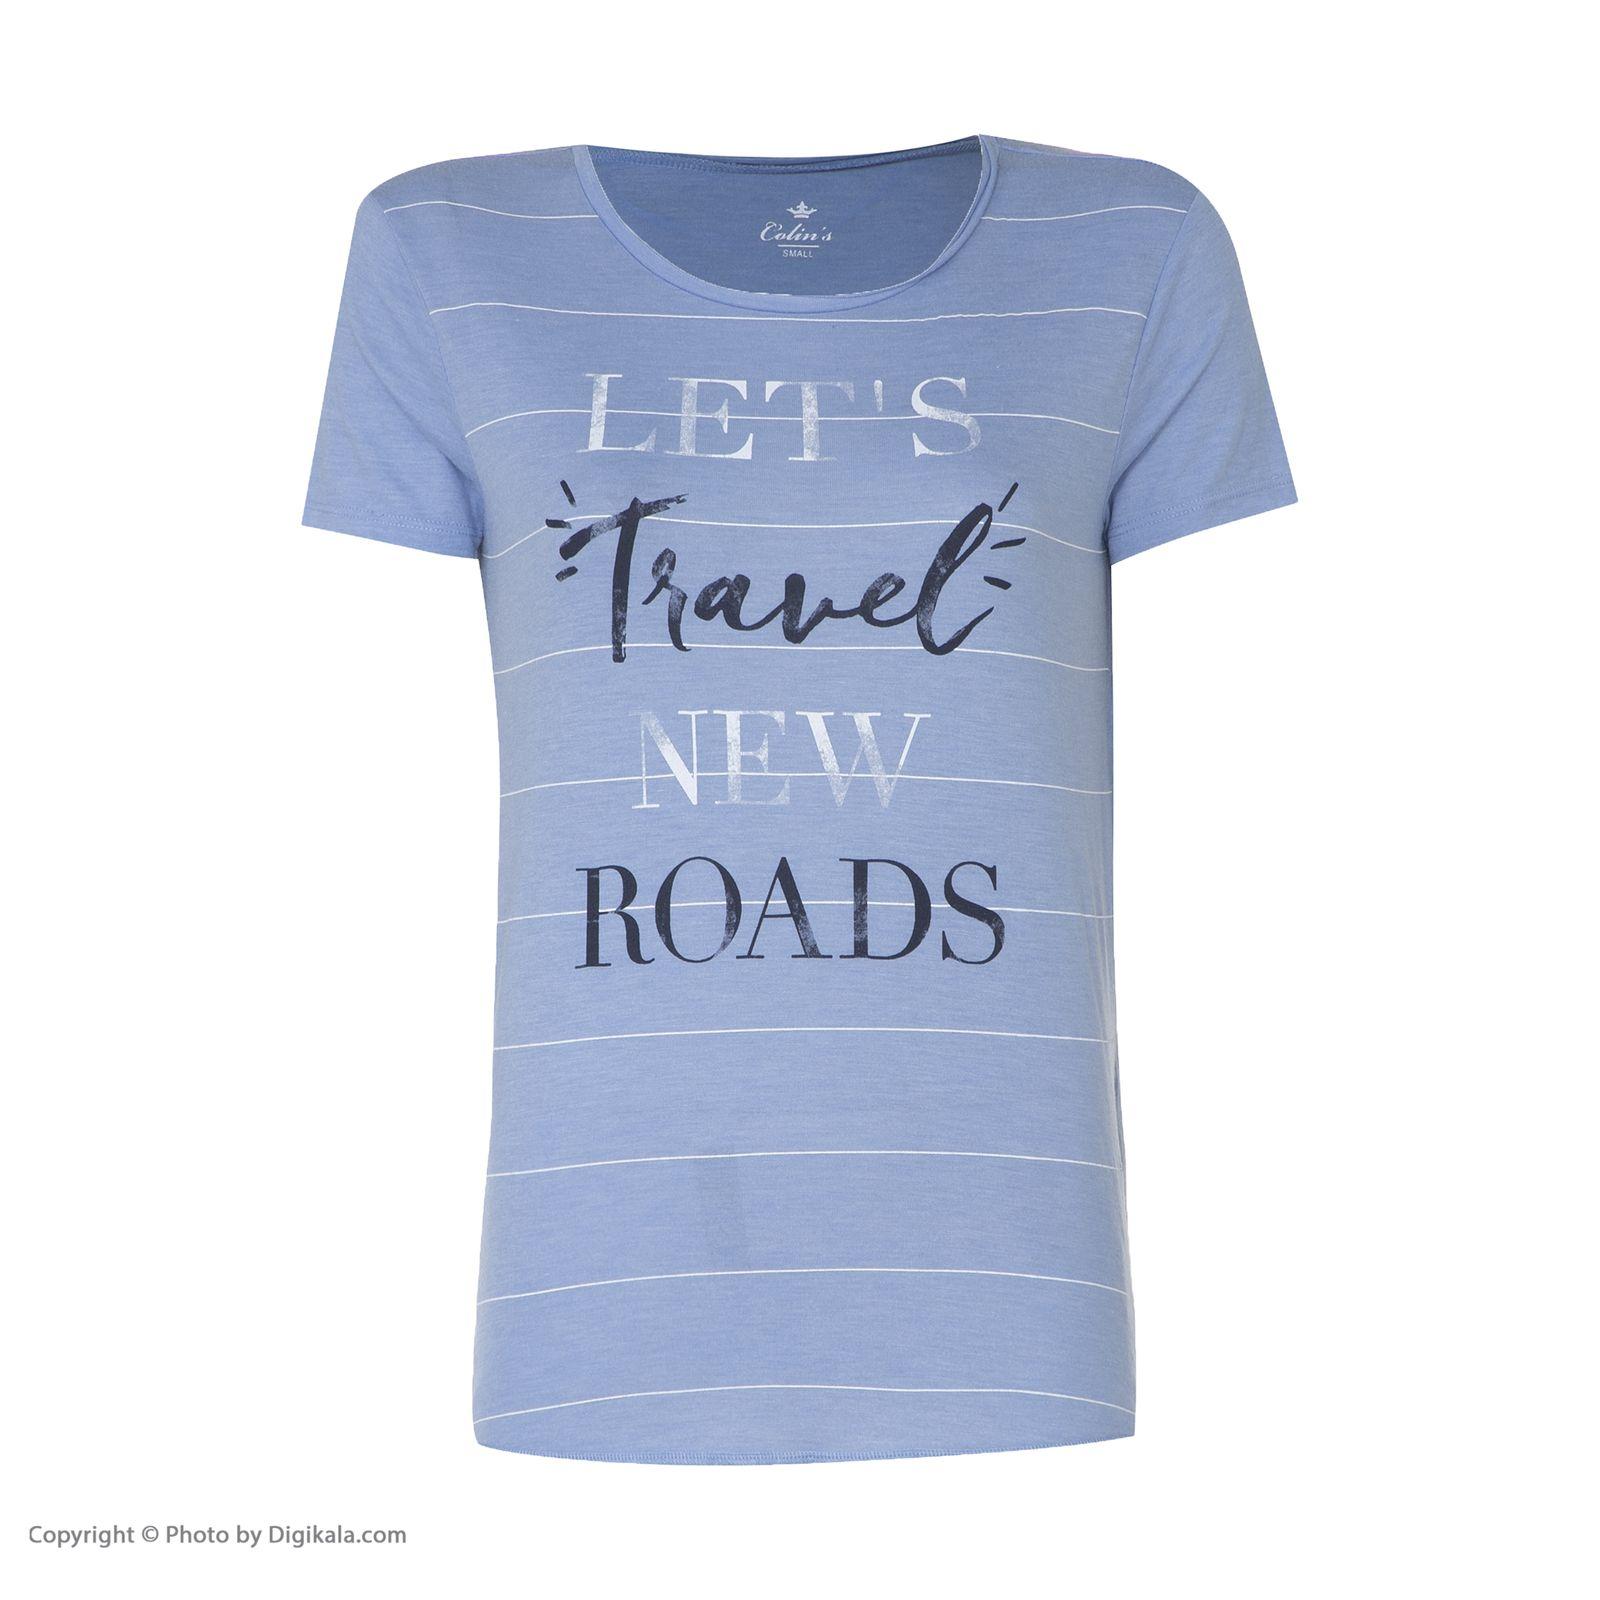 تی شرت زنانه کالینز مدل CL1026819-BLUEMELANGE main 1 1